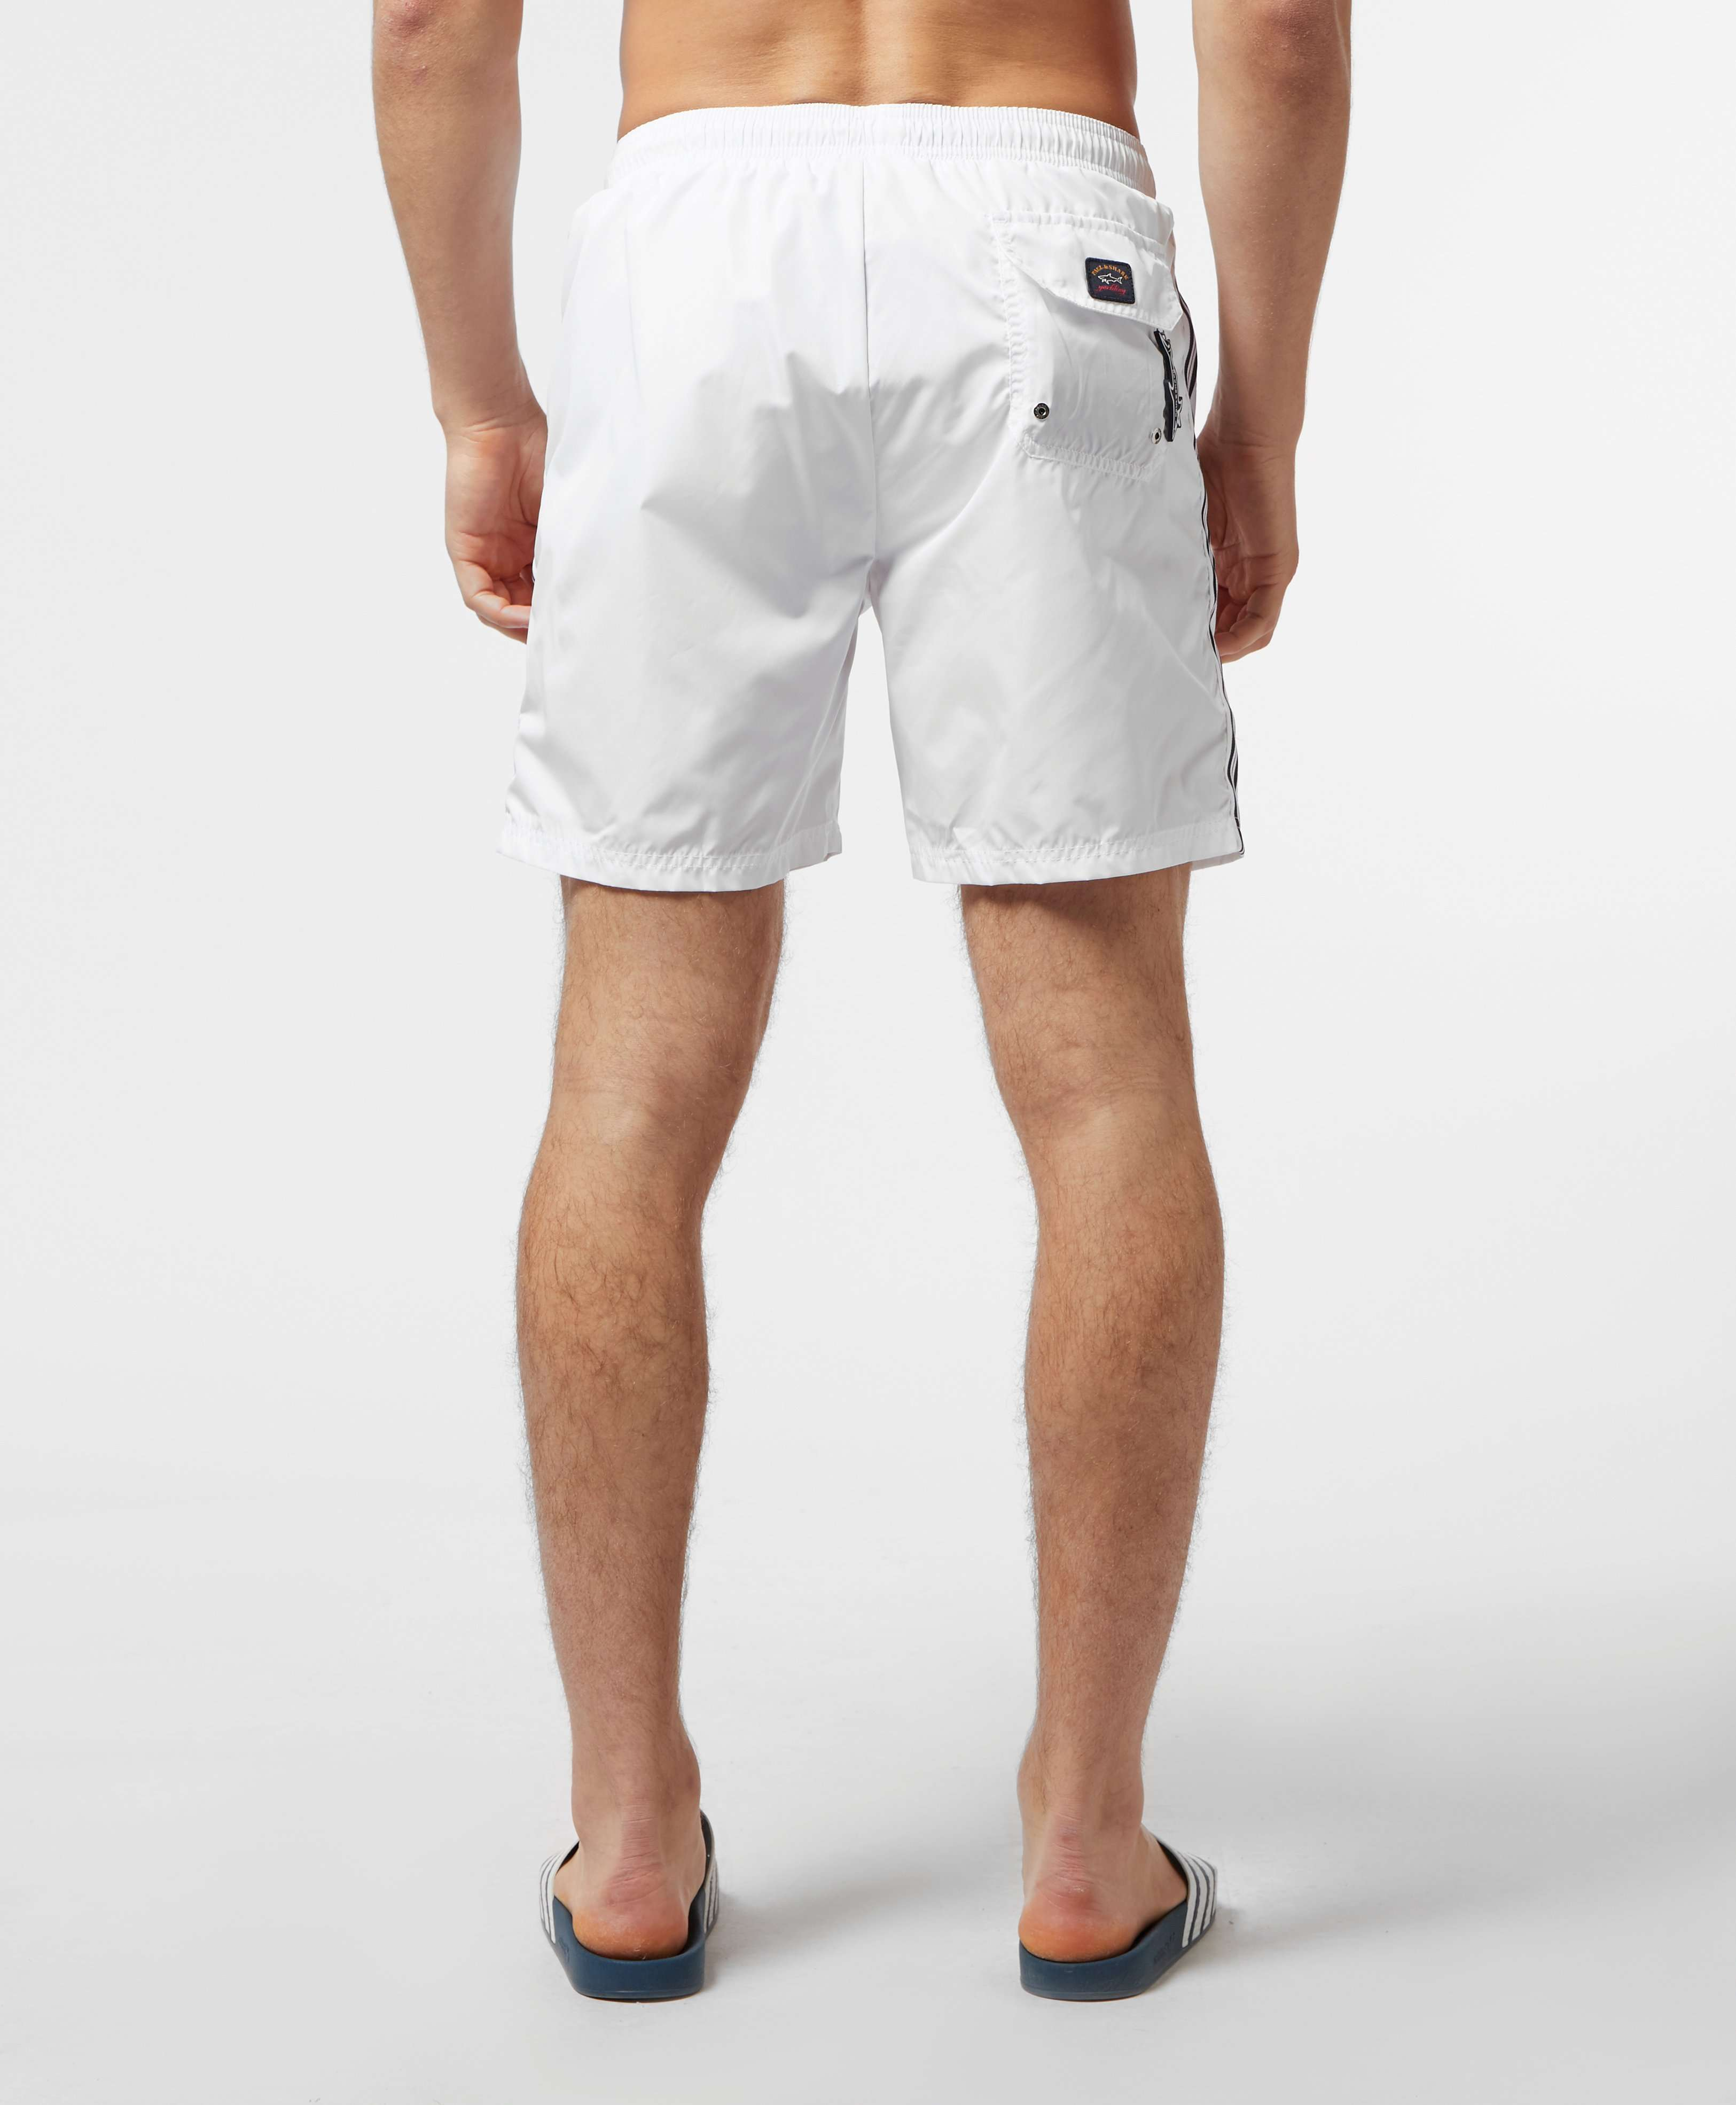 Paul and Shark Tape Swim Shorts